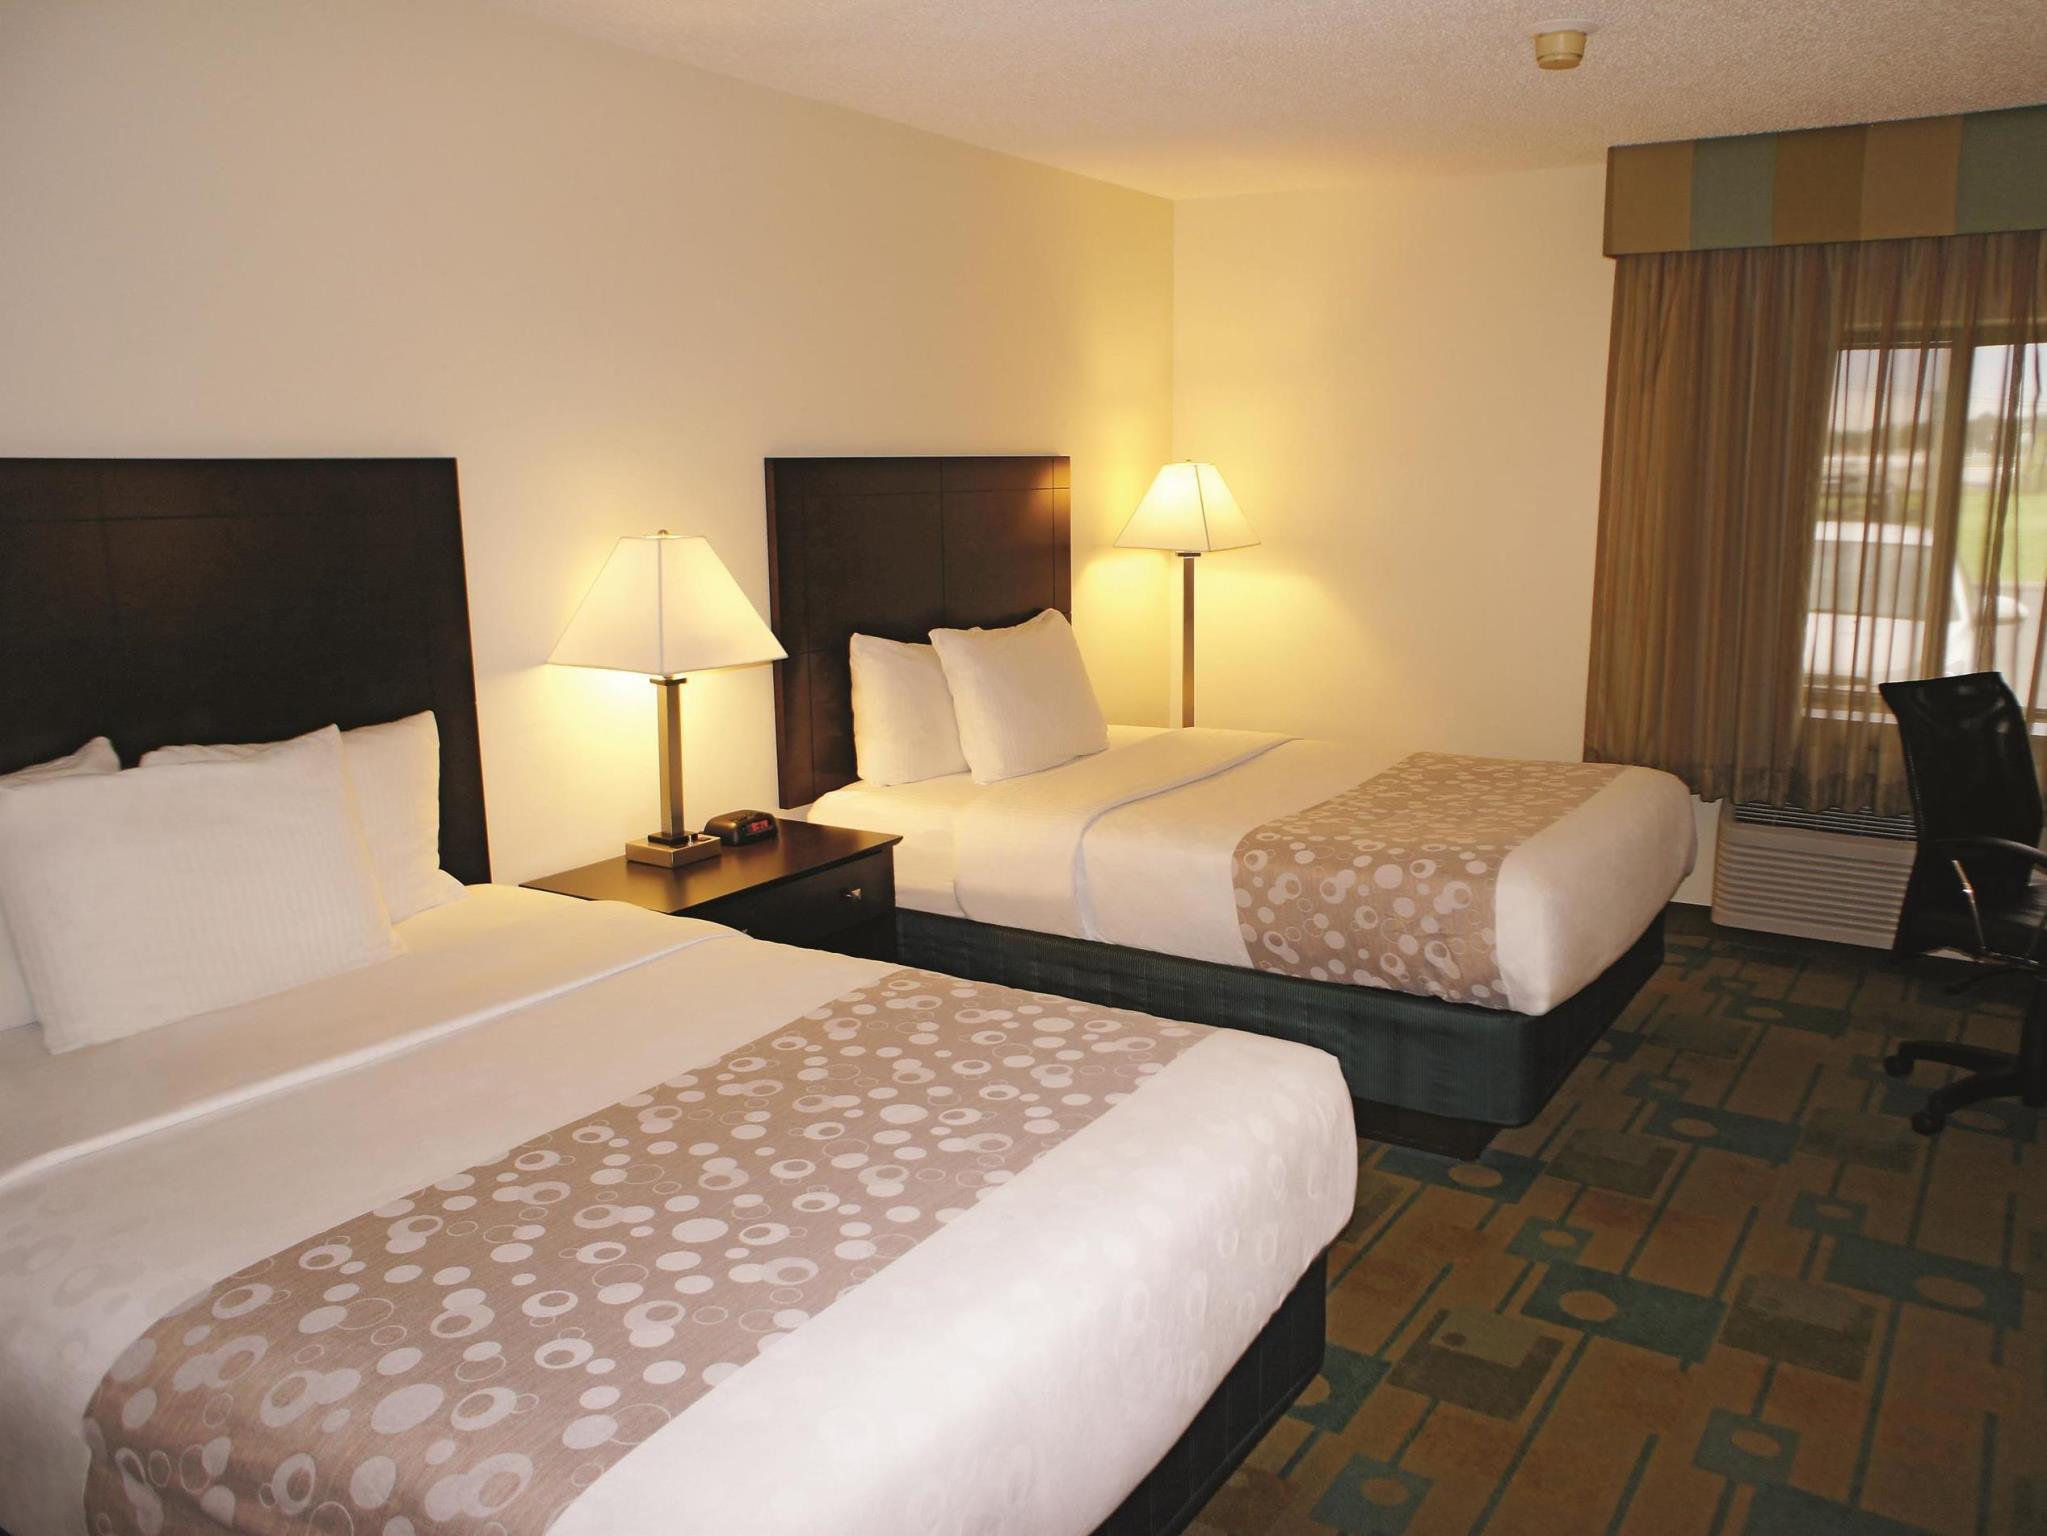 La Quinta Inn & Suites By Wyndham Jackson